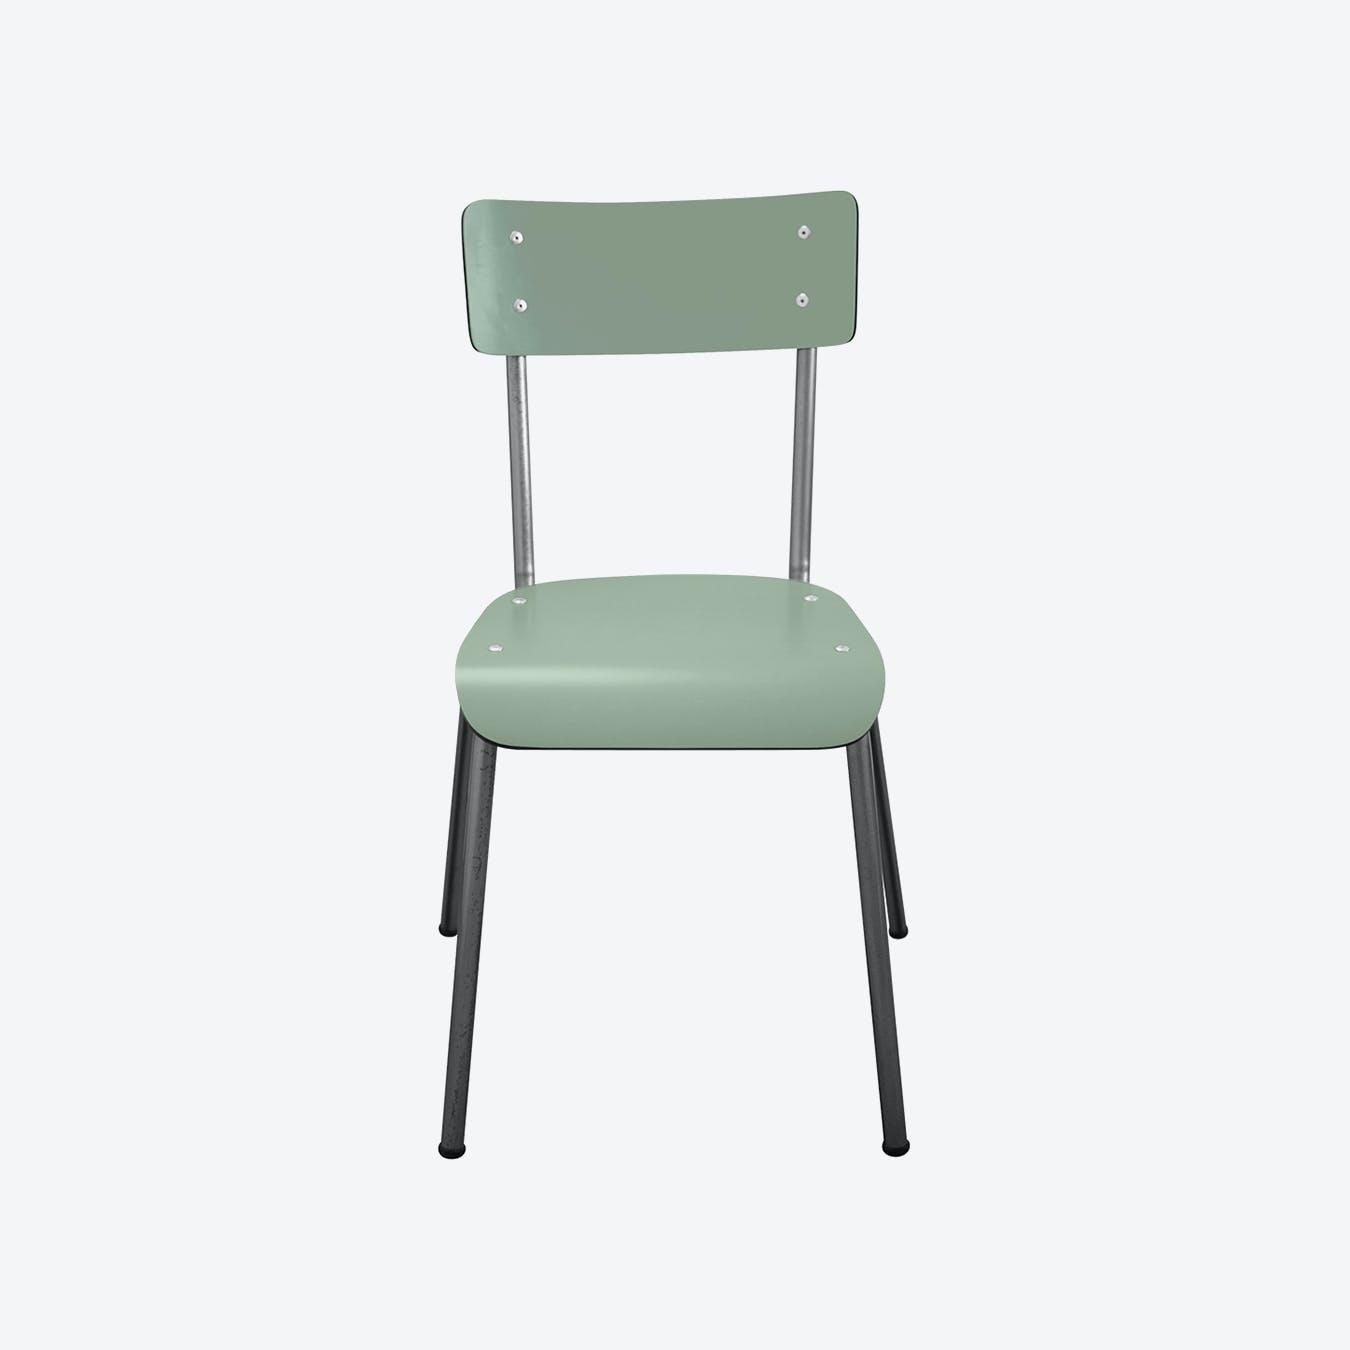 Suzie Chair w/ Steel Legs - Khaki